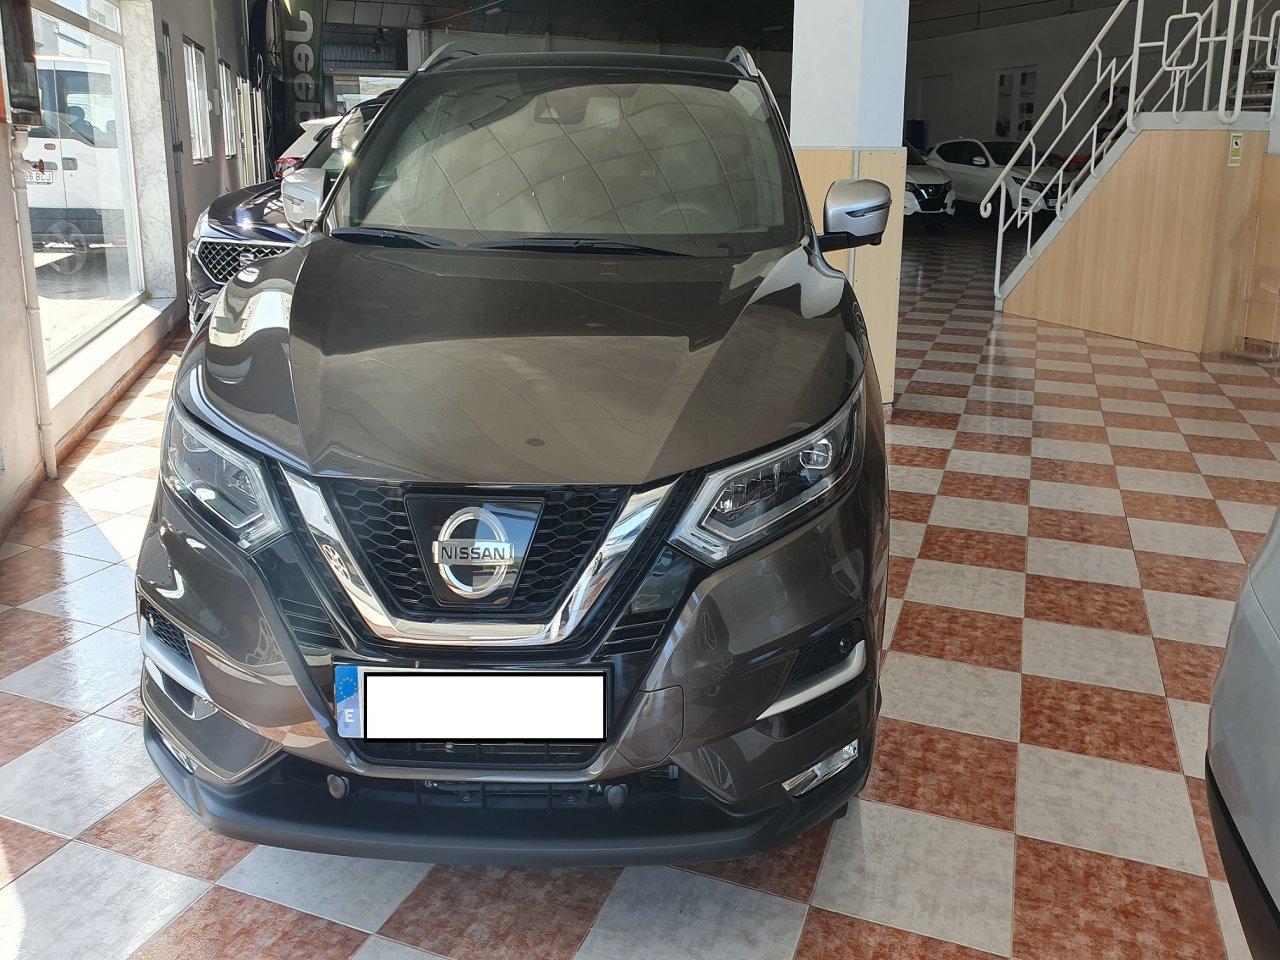 Nissan QASHQAI 1.6 DCI 130 CV XTRONIC TEKNA PLUS